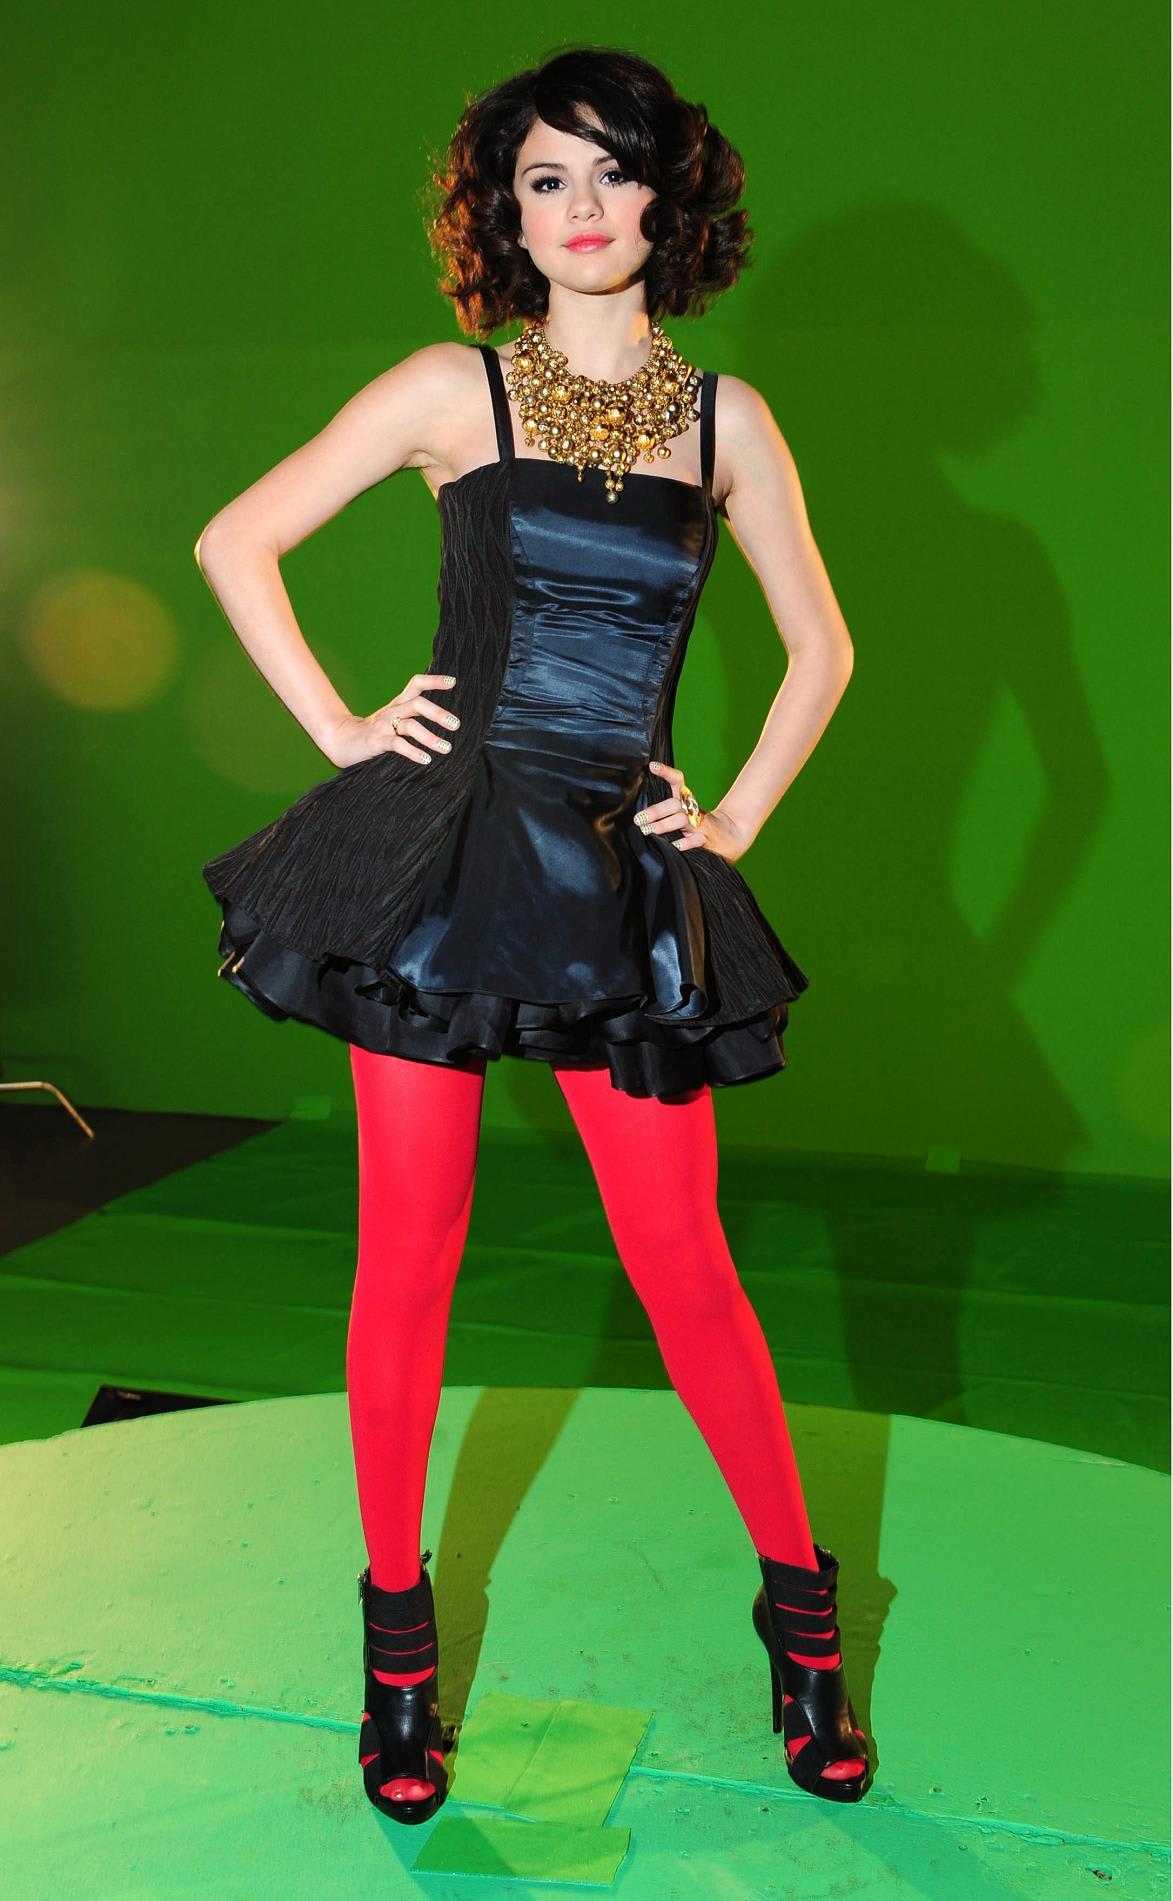 Selena Gomez - Music Video Photoshoot 2009 (2) - ☆Favorite ...